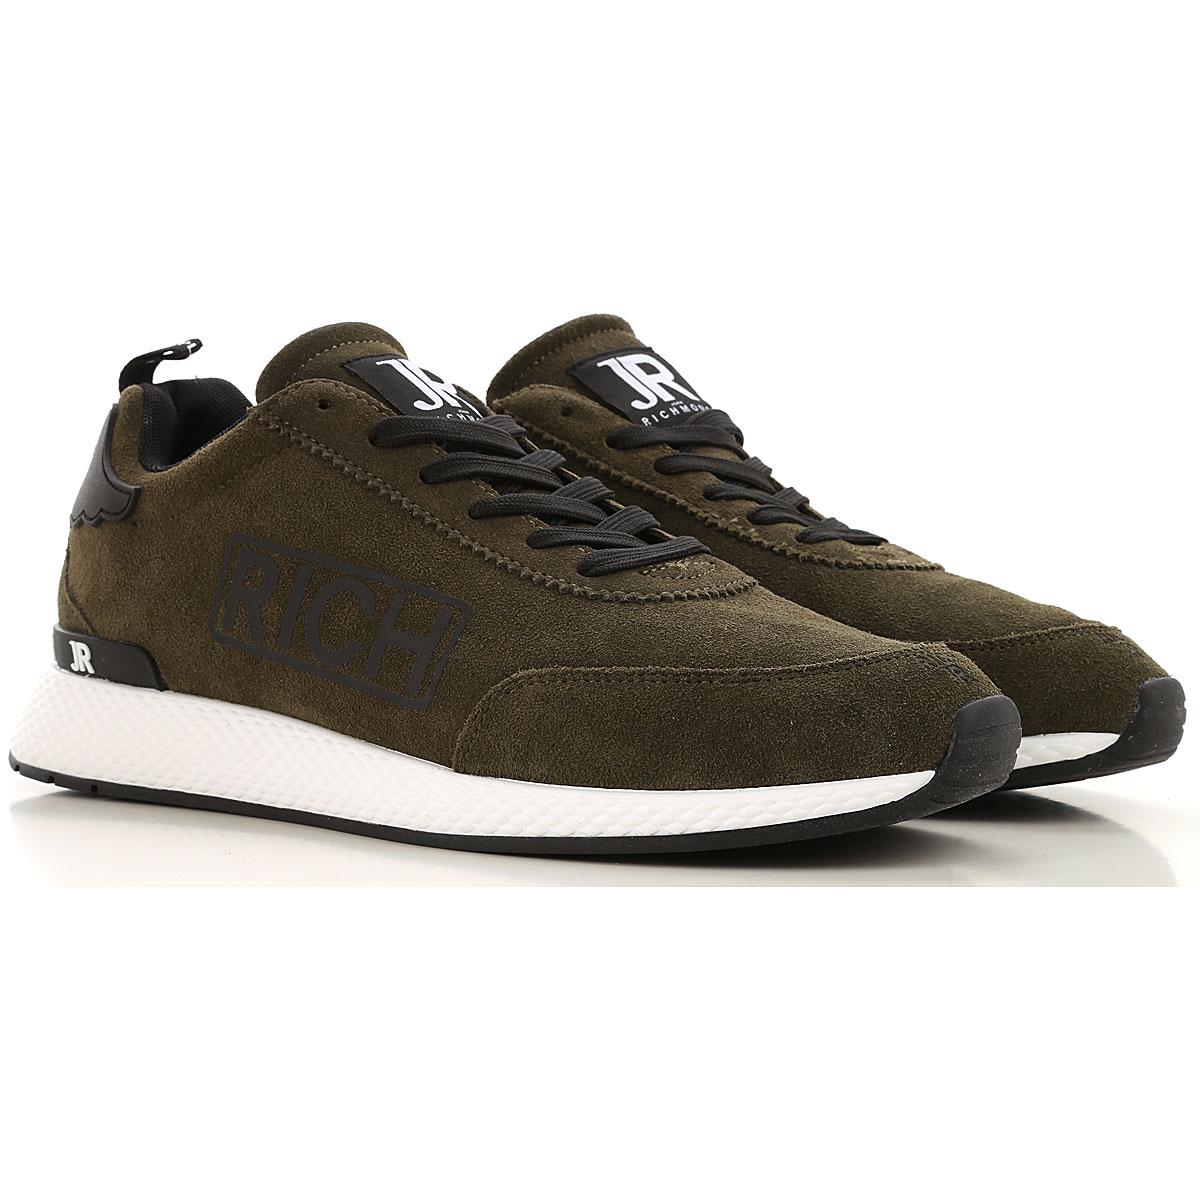 Richmond Sneaker Homme, Vert forêt, Daim, 2019, 41 42 43 44.5 46